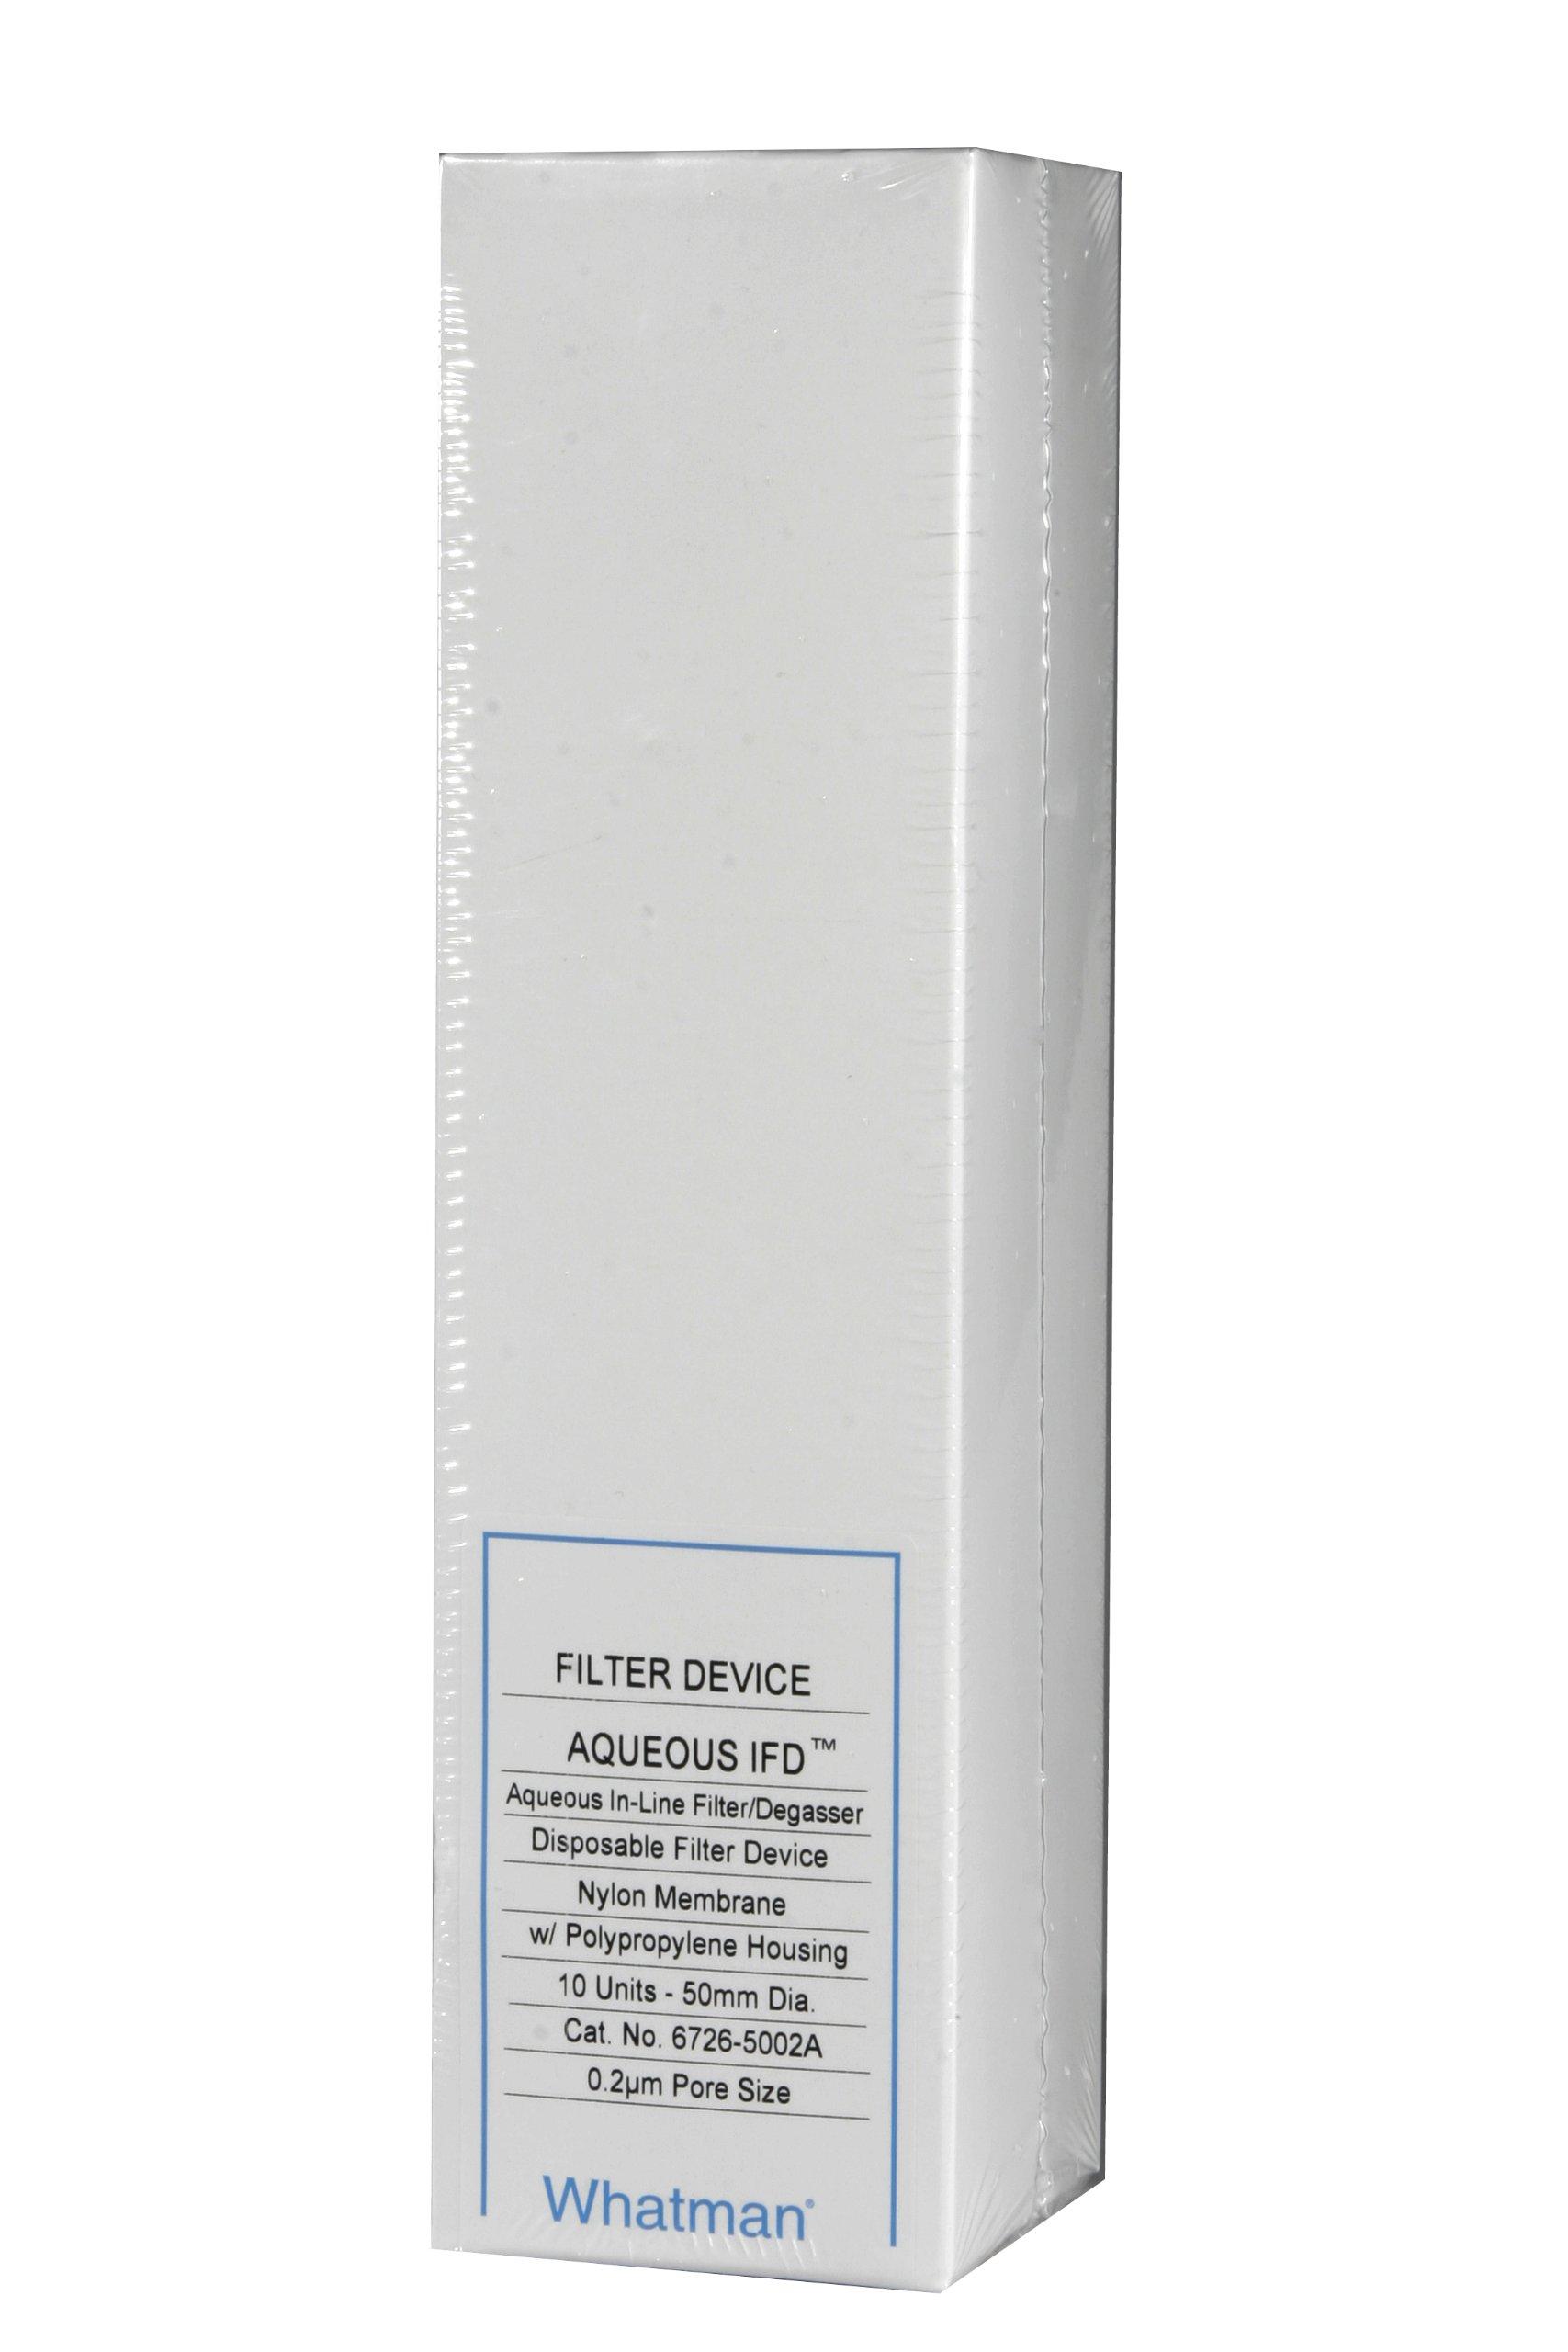 Whatman 6726-5002A Aqueous IFD Nylon In-line Filter, 42 psi Maximum Pressure, 0.2 Micron, 2.5mL/min Flow Rate, 50mm Diameter (Pack of 10) by Whatman